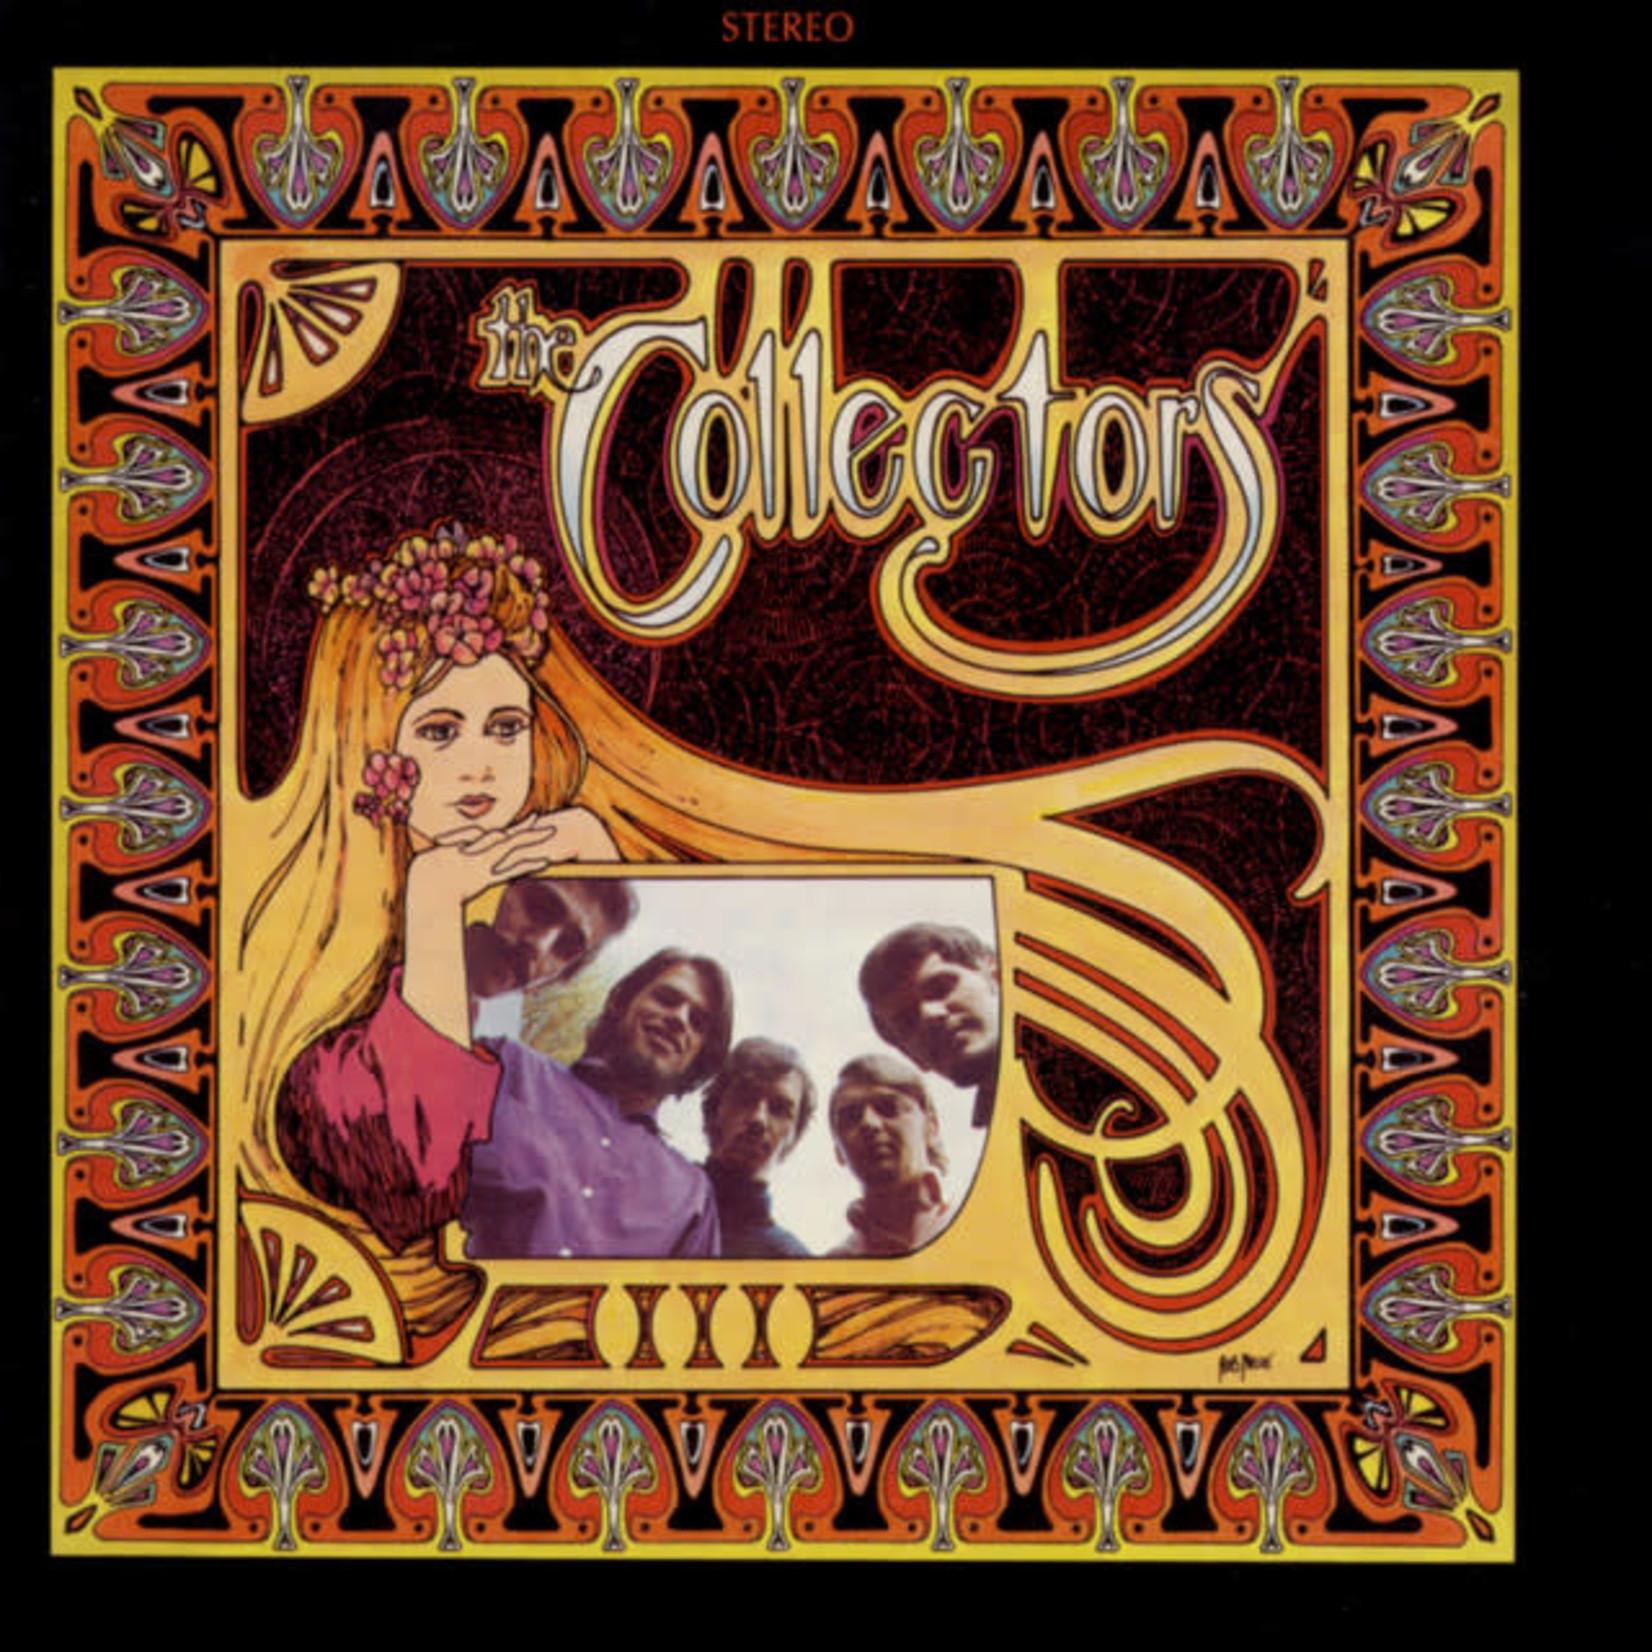 Vinyl The Collectors - ST